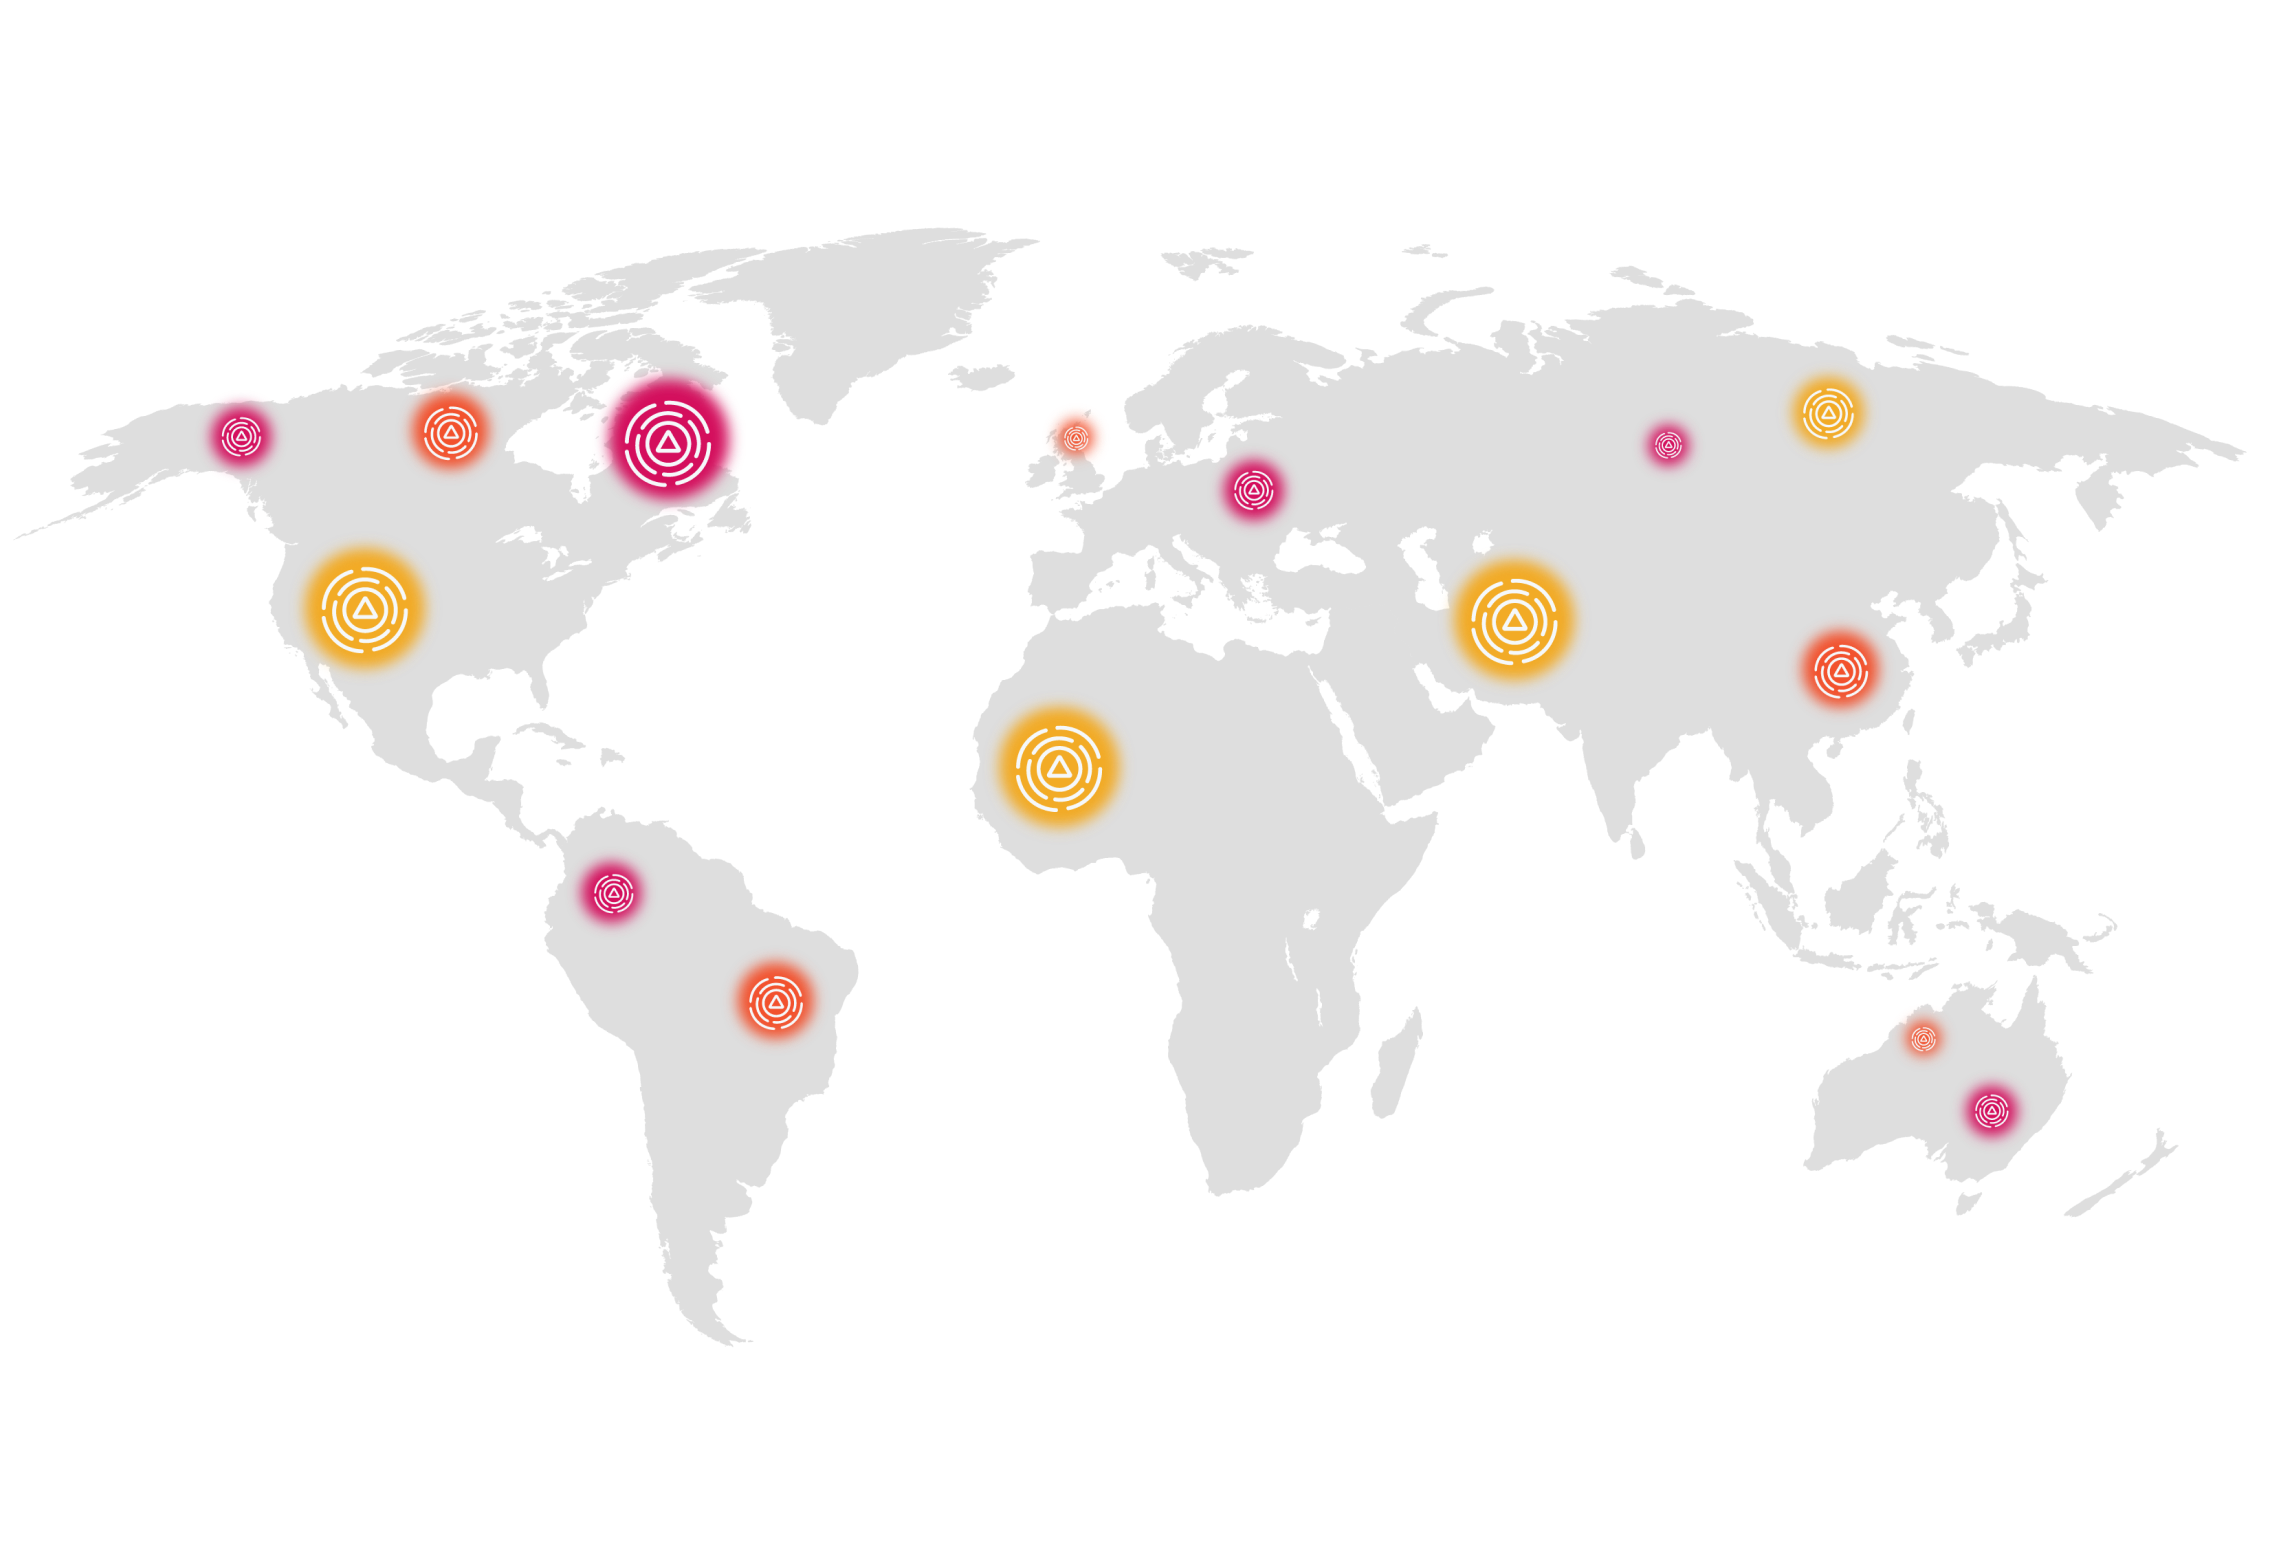 threatops-map-p2-01 1